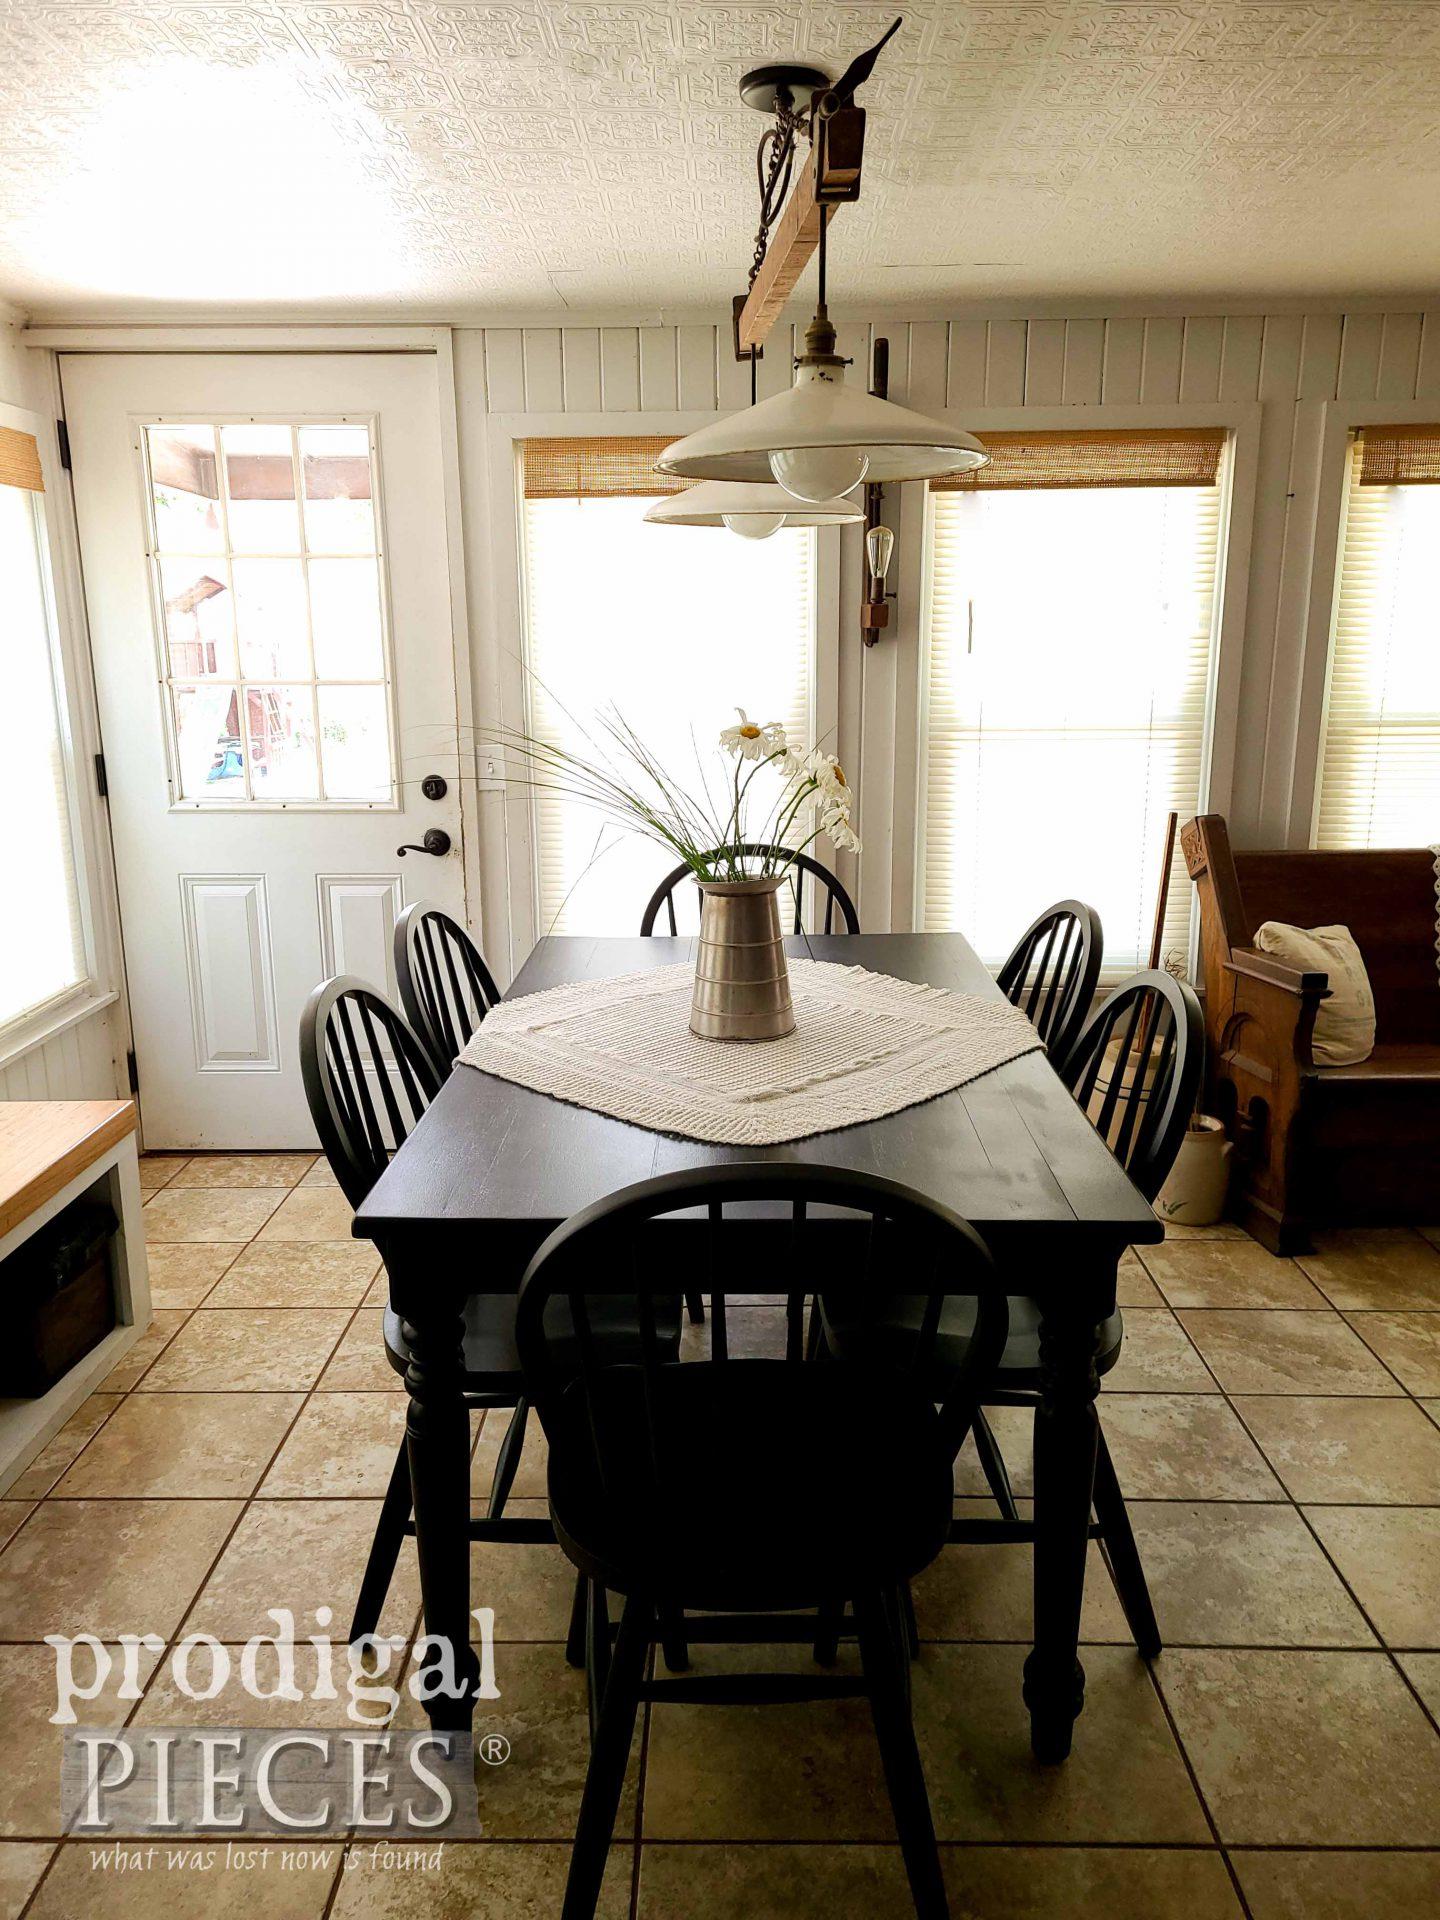 Vintage Windsor Farmhouse Dining Table Set by Larissa of Prodigal Pieces | prodigalpieces.com #prodigalpieces #diy #home #homedecor #furniture